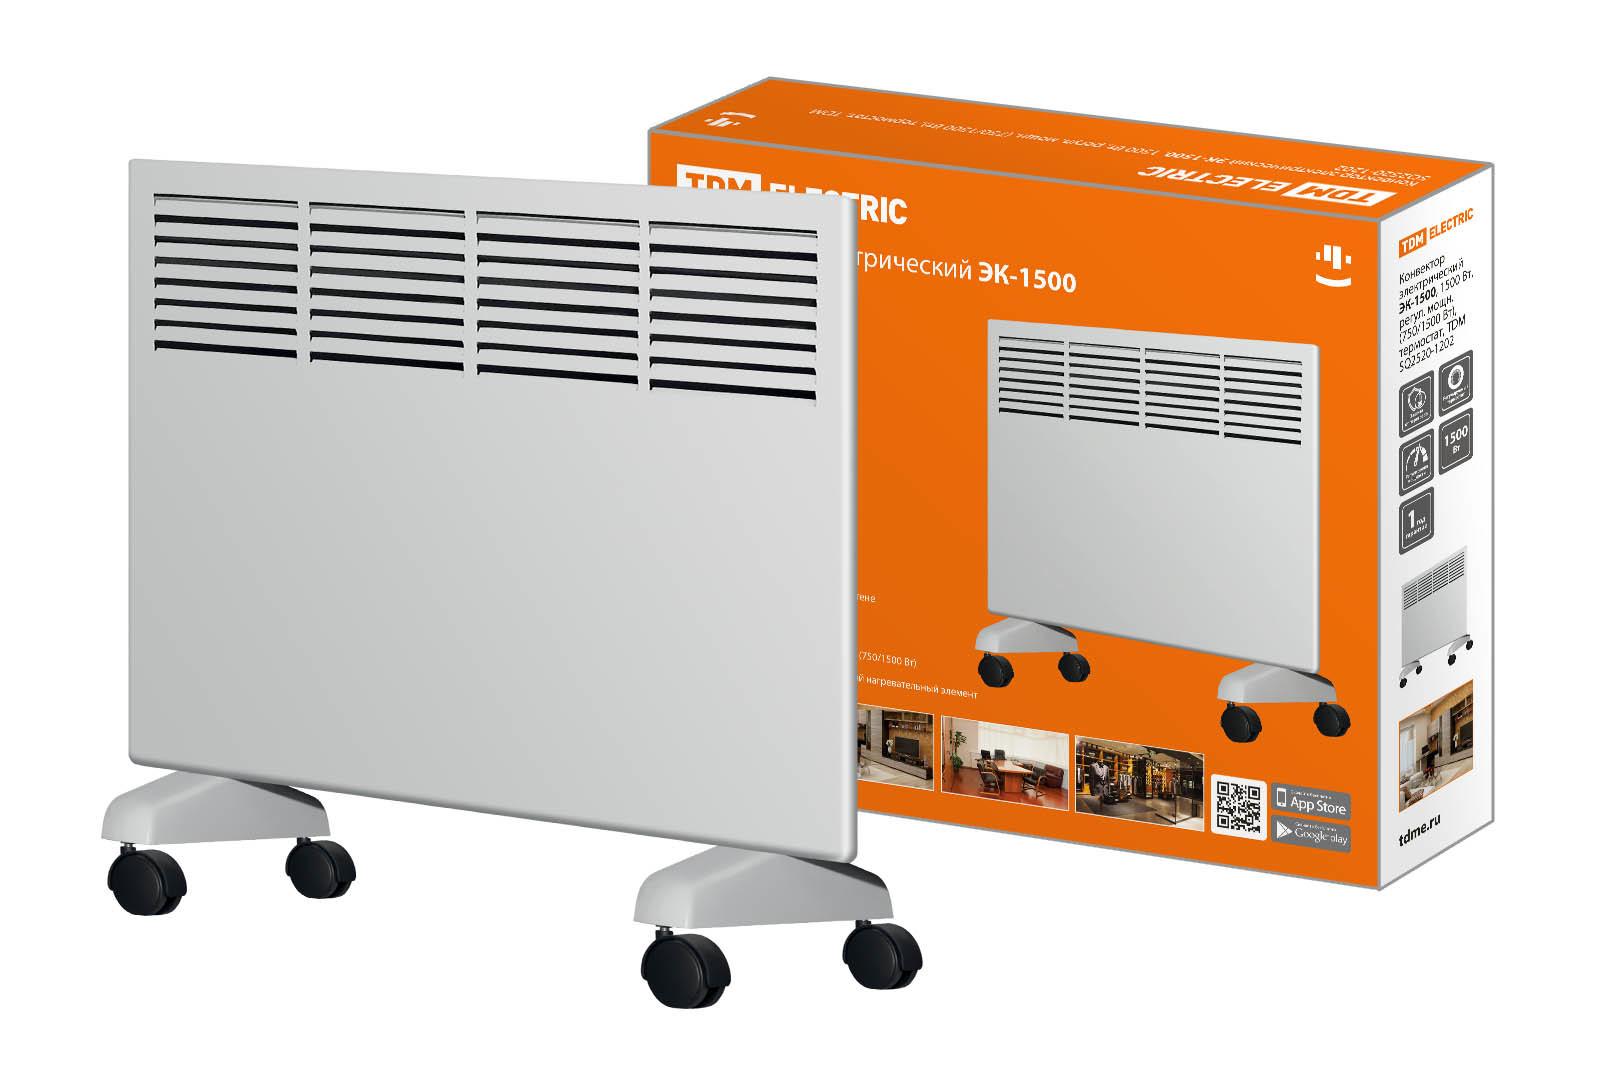 Конвектор электрический ЭК-1500, 1500 Вт, регул. мощн. (750/1500 Вт), термостат, TDM